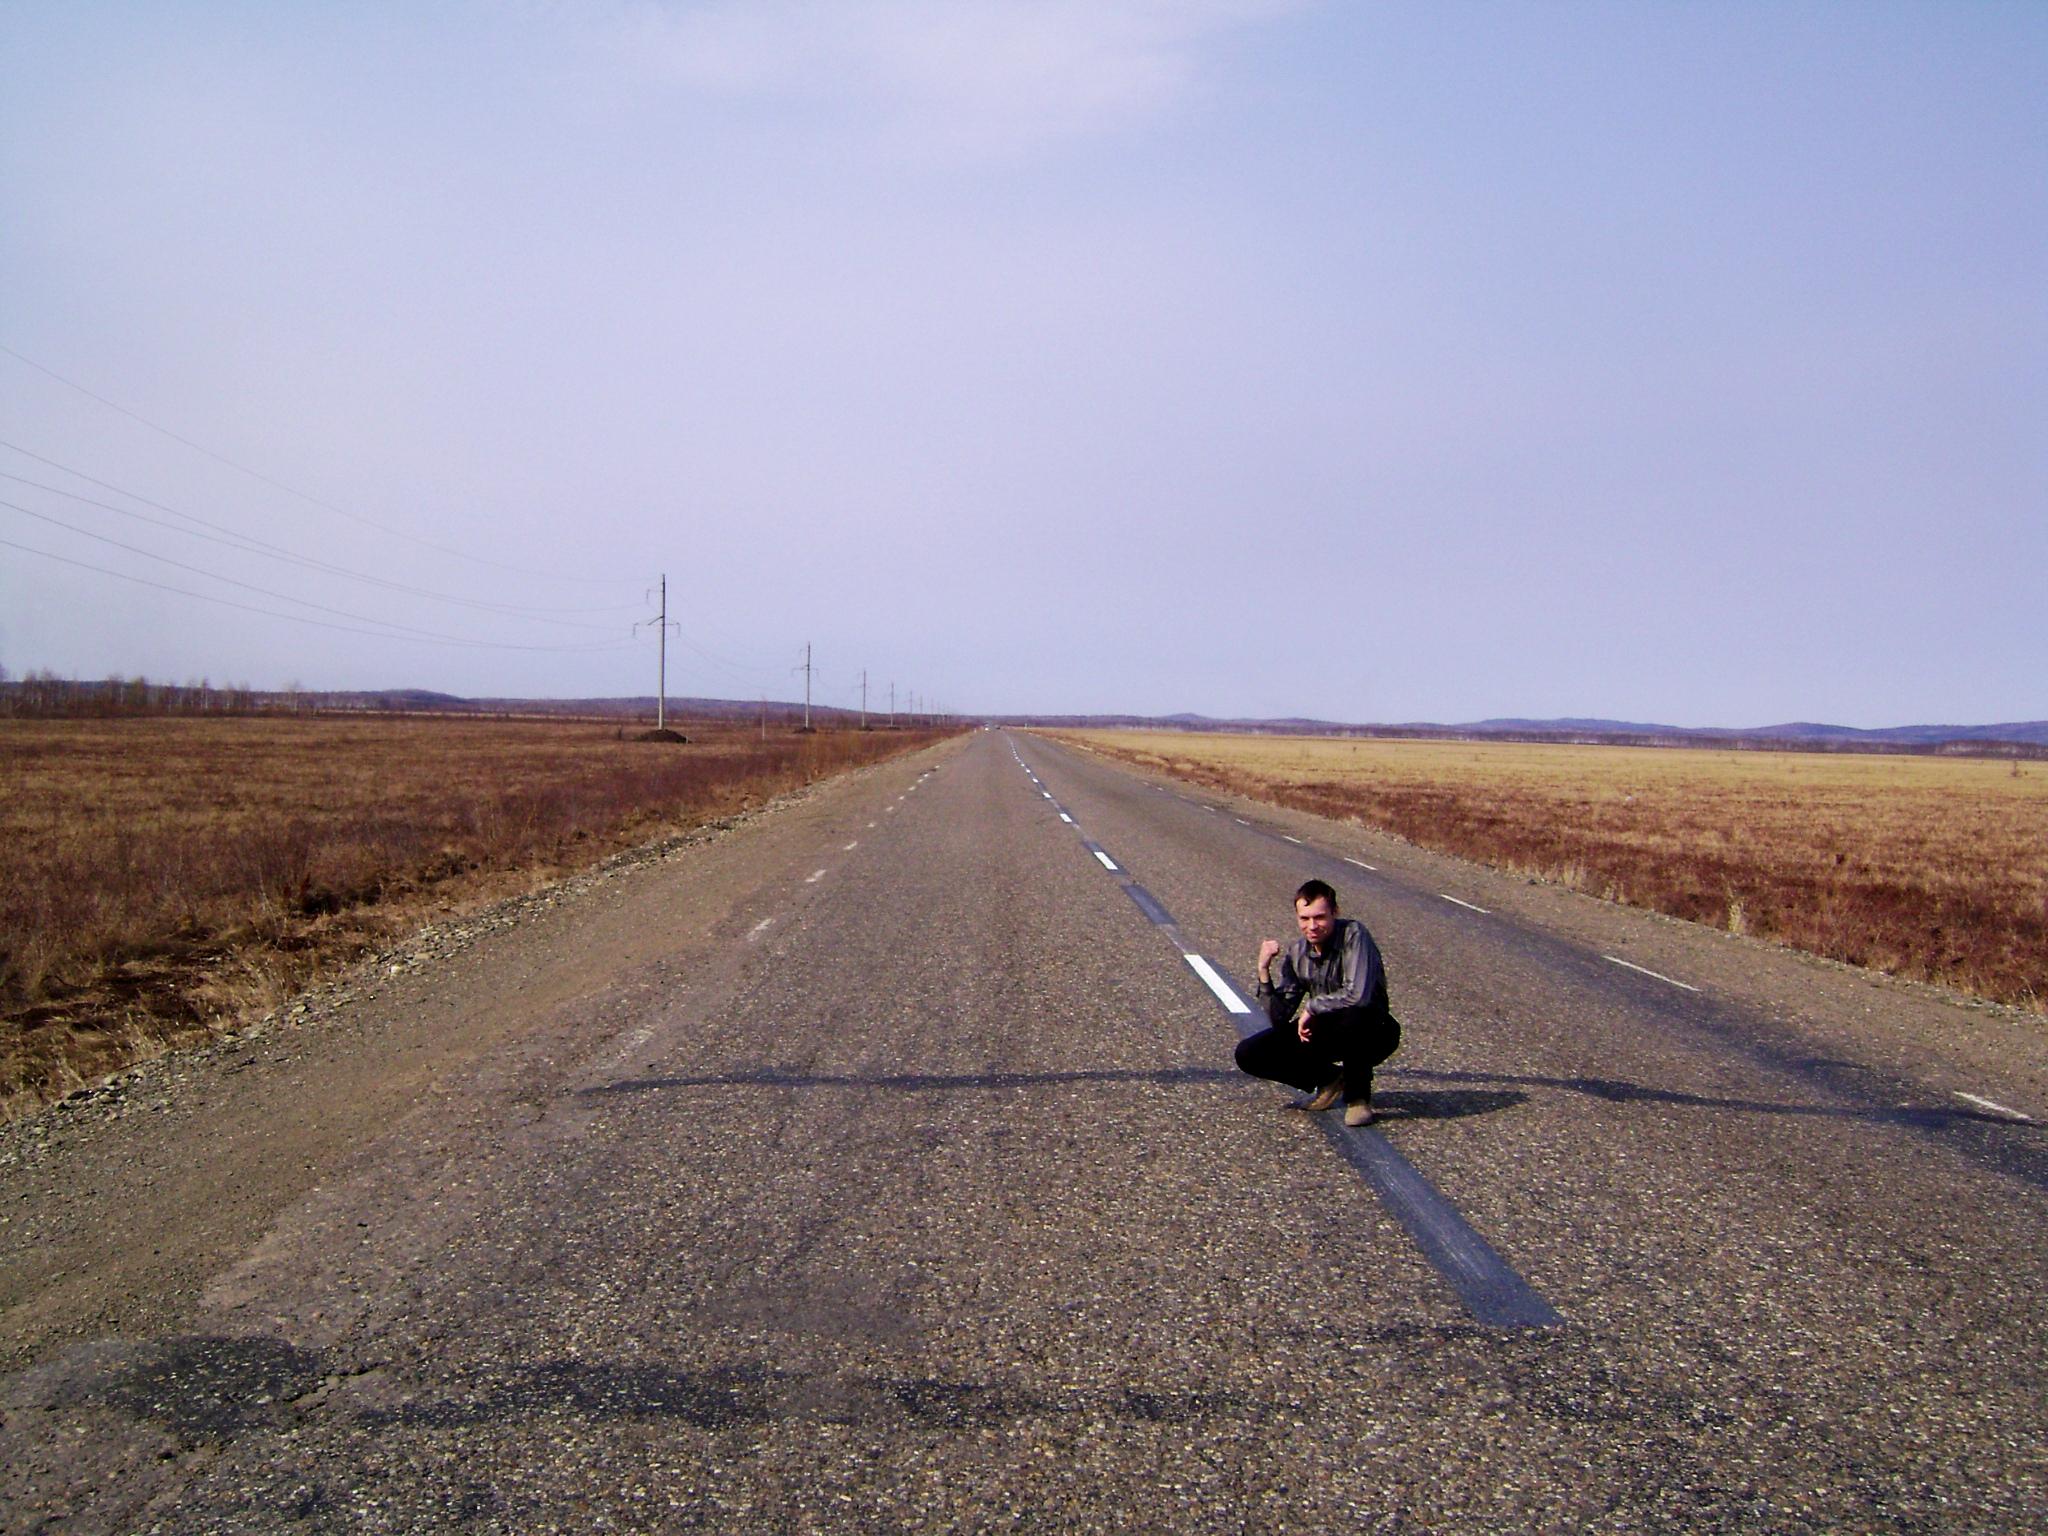 картинки дорога в даль на машине